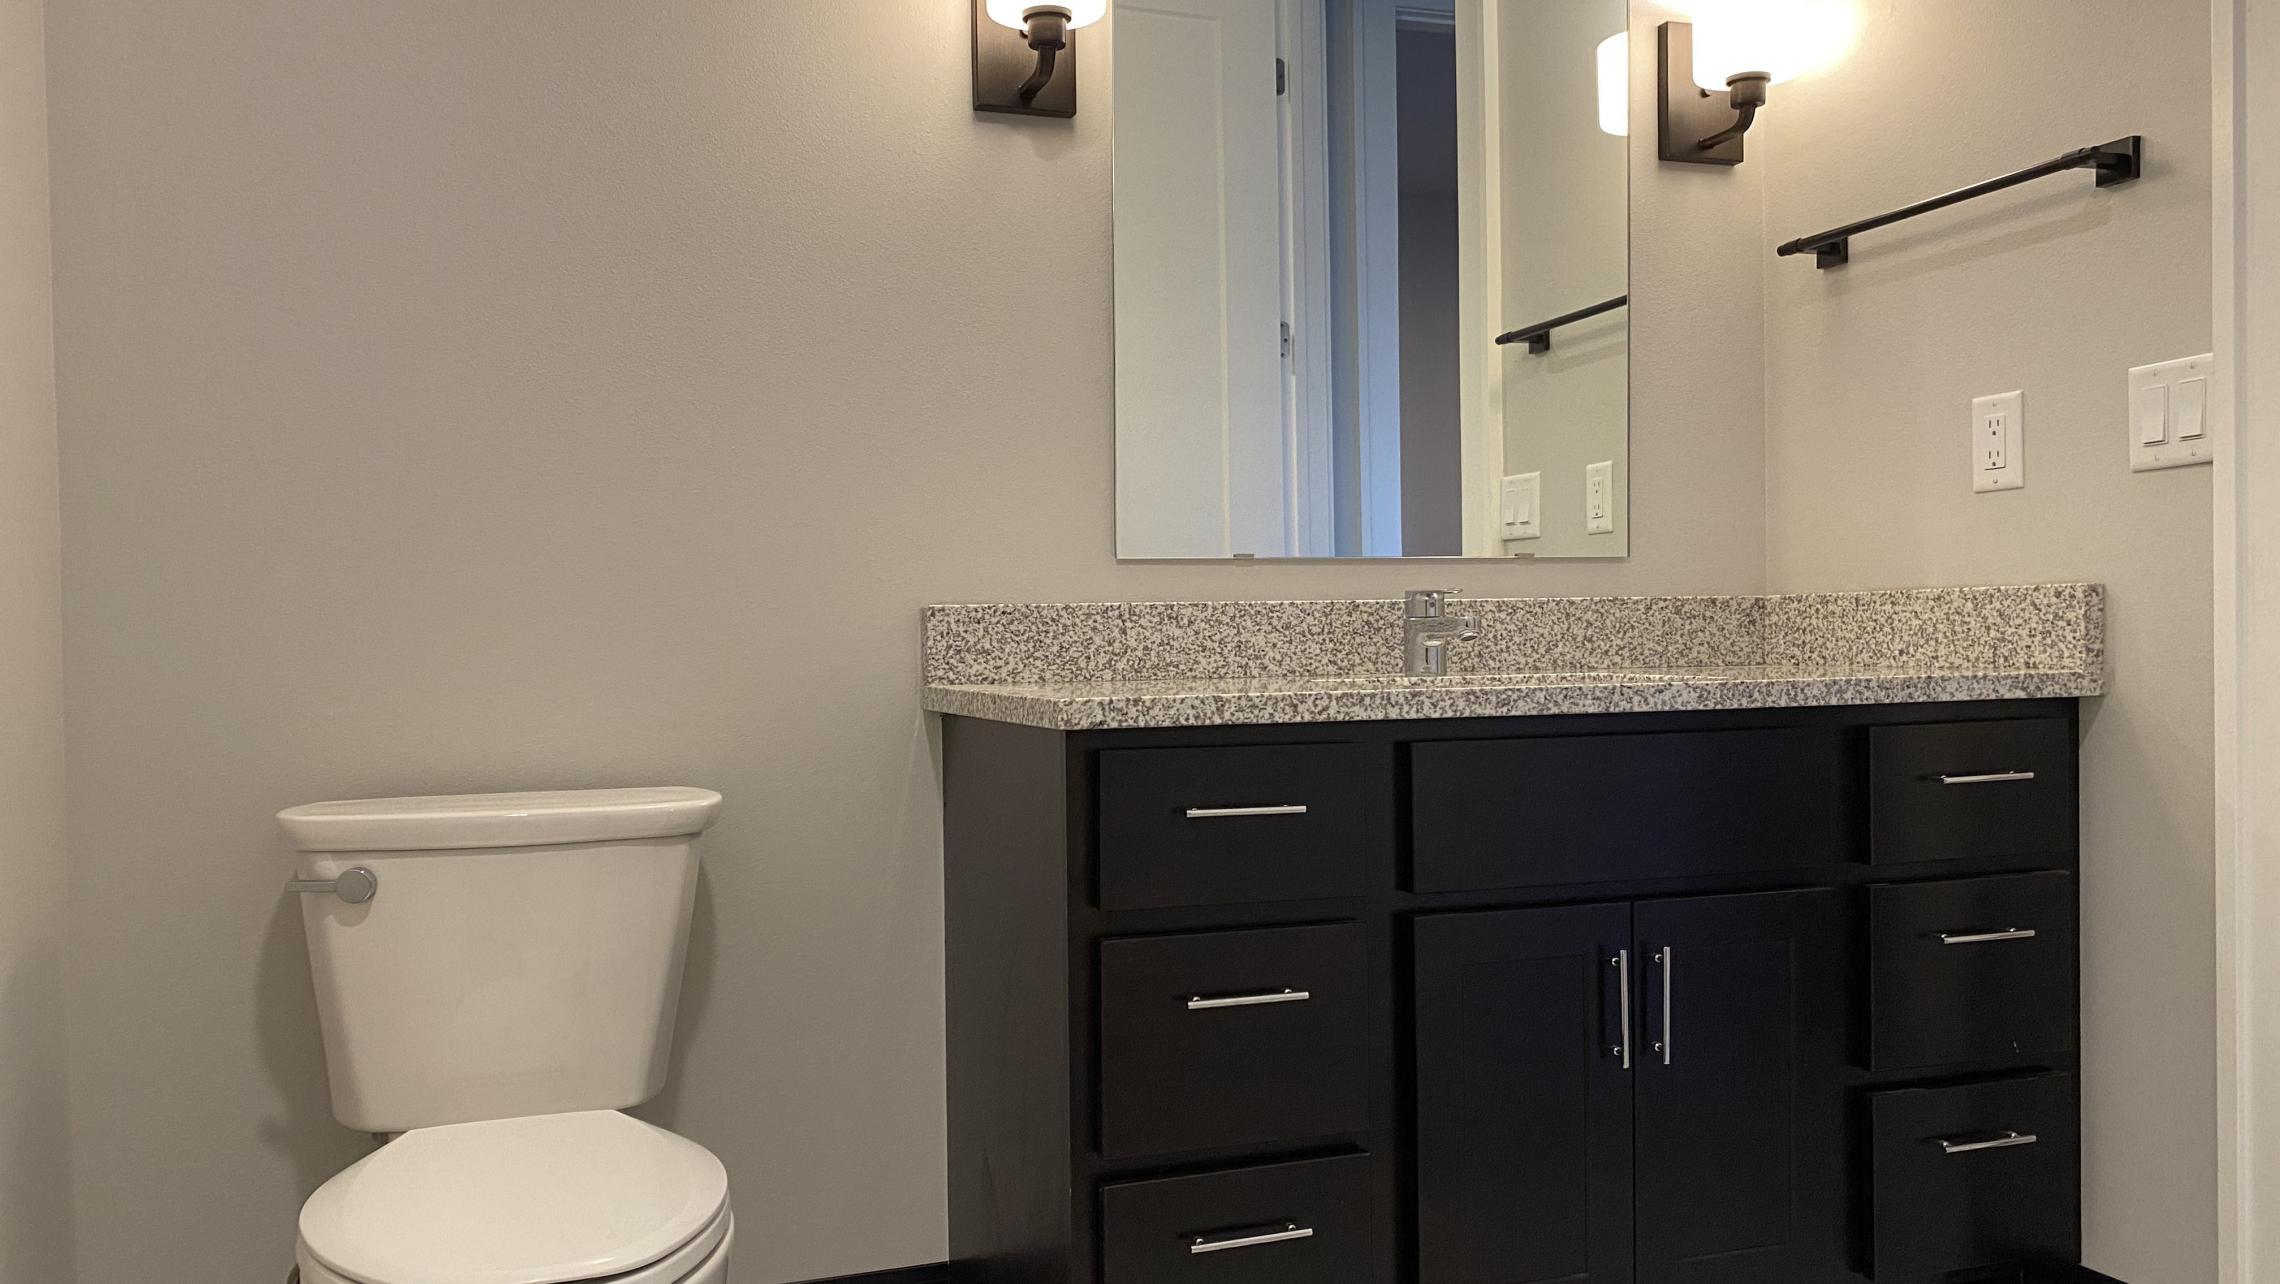 1722-Monroe-Apartment-220-Three Bedroom-Modern-Luxury-Corner-Balcony-Urban-Living-Bathroom-Vanity